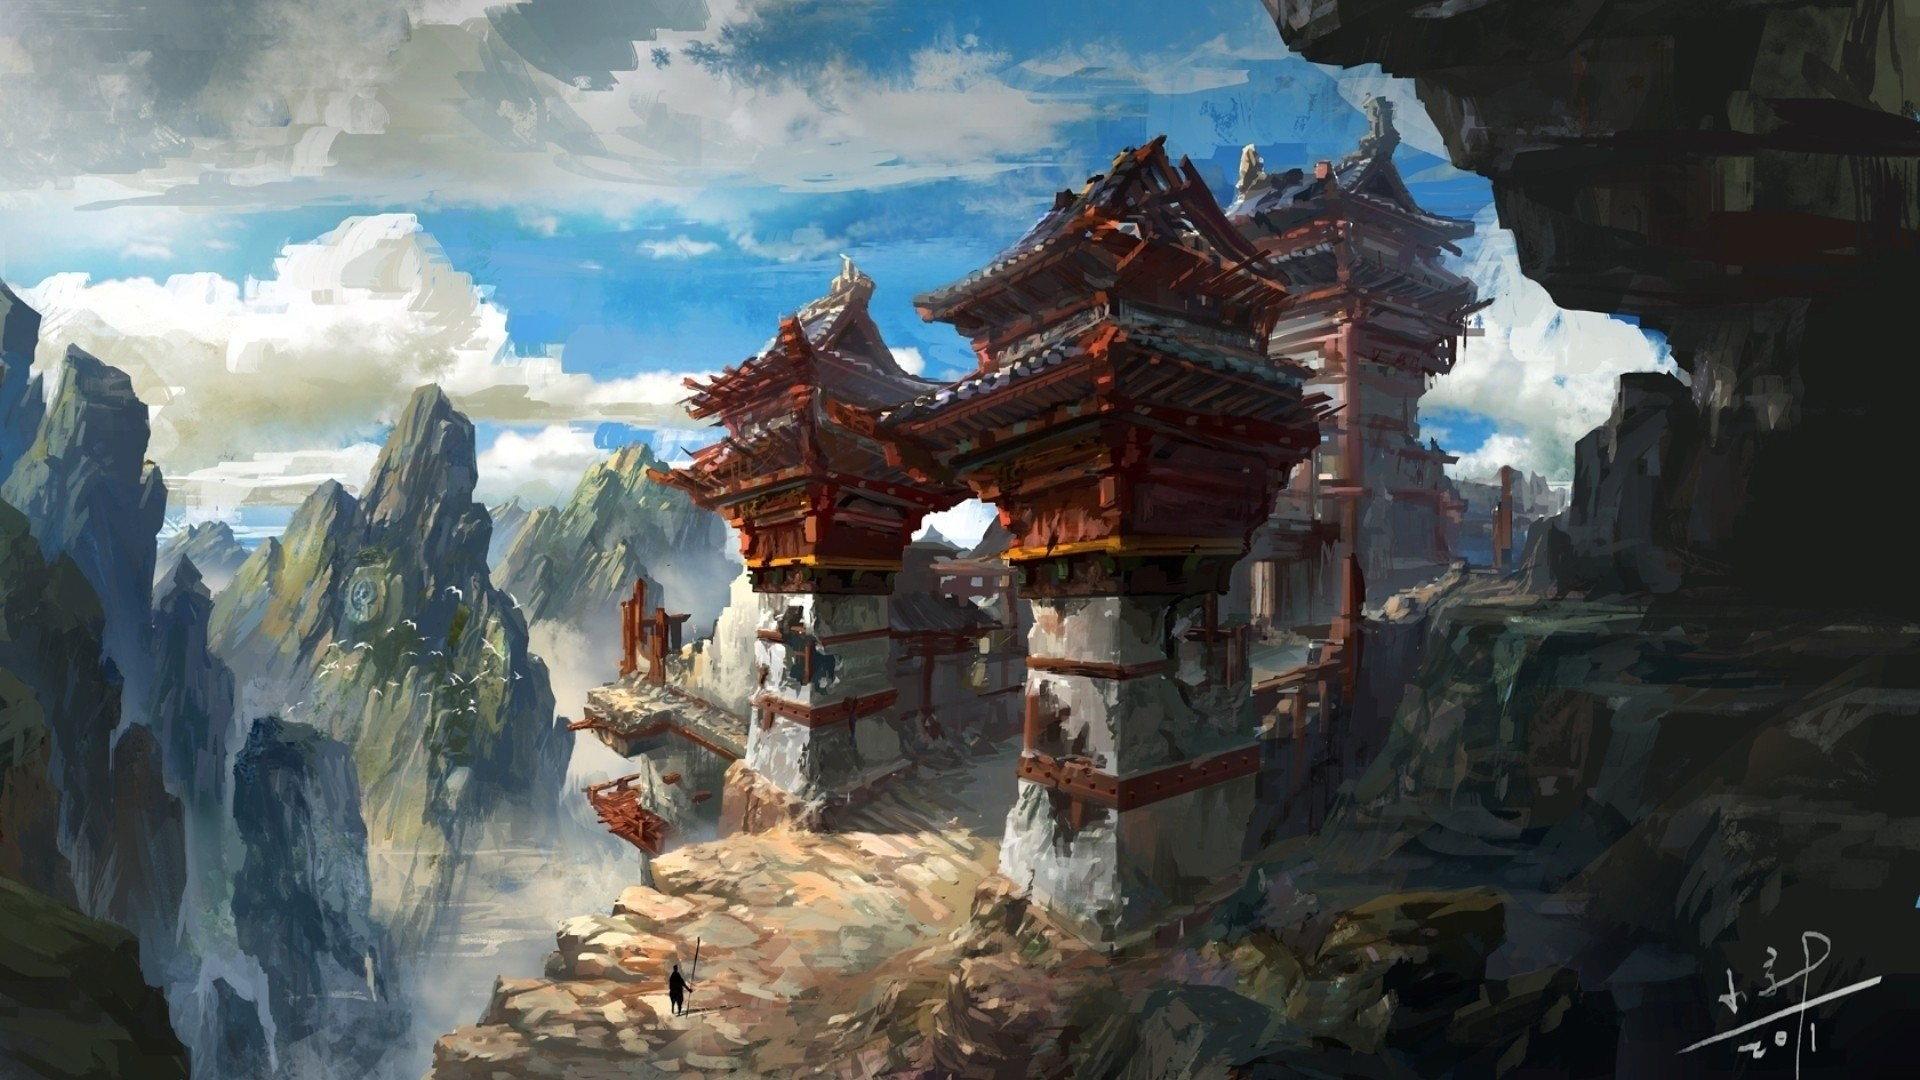 Res: 1920x1080, artwork asia clouds fantasy art landscapes mountains